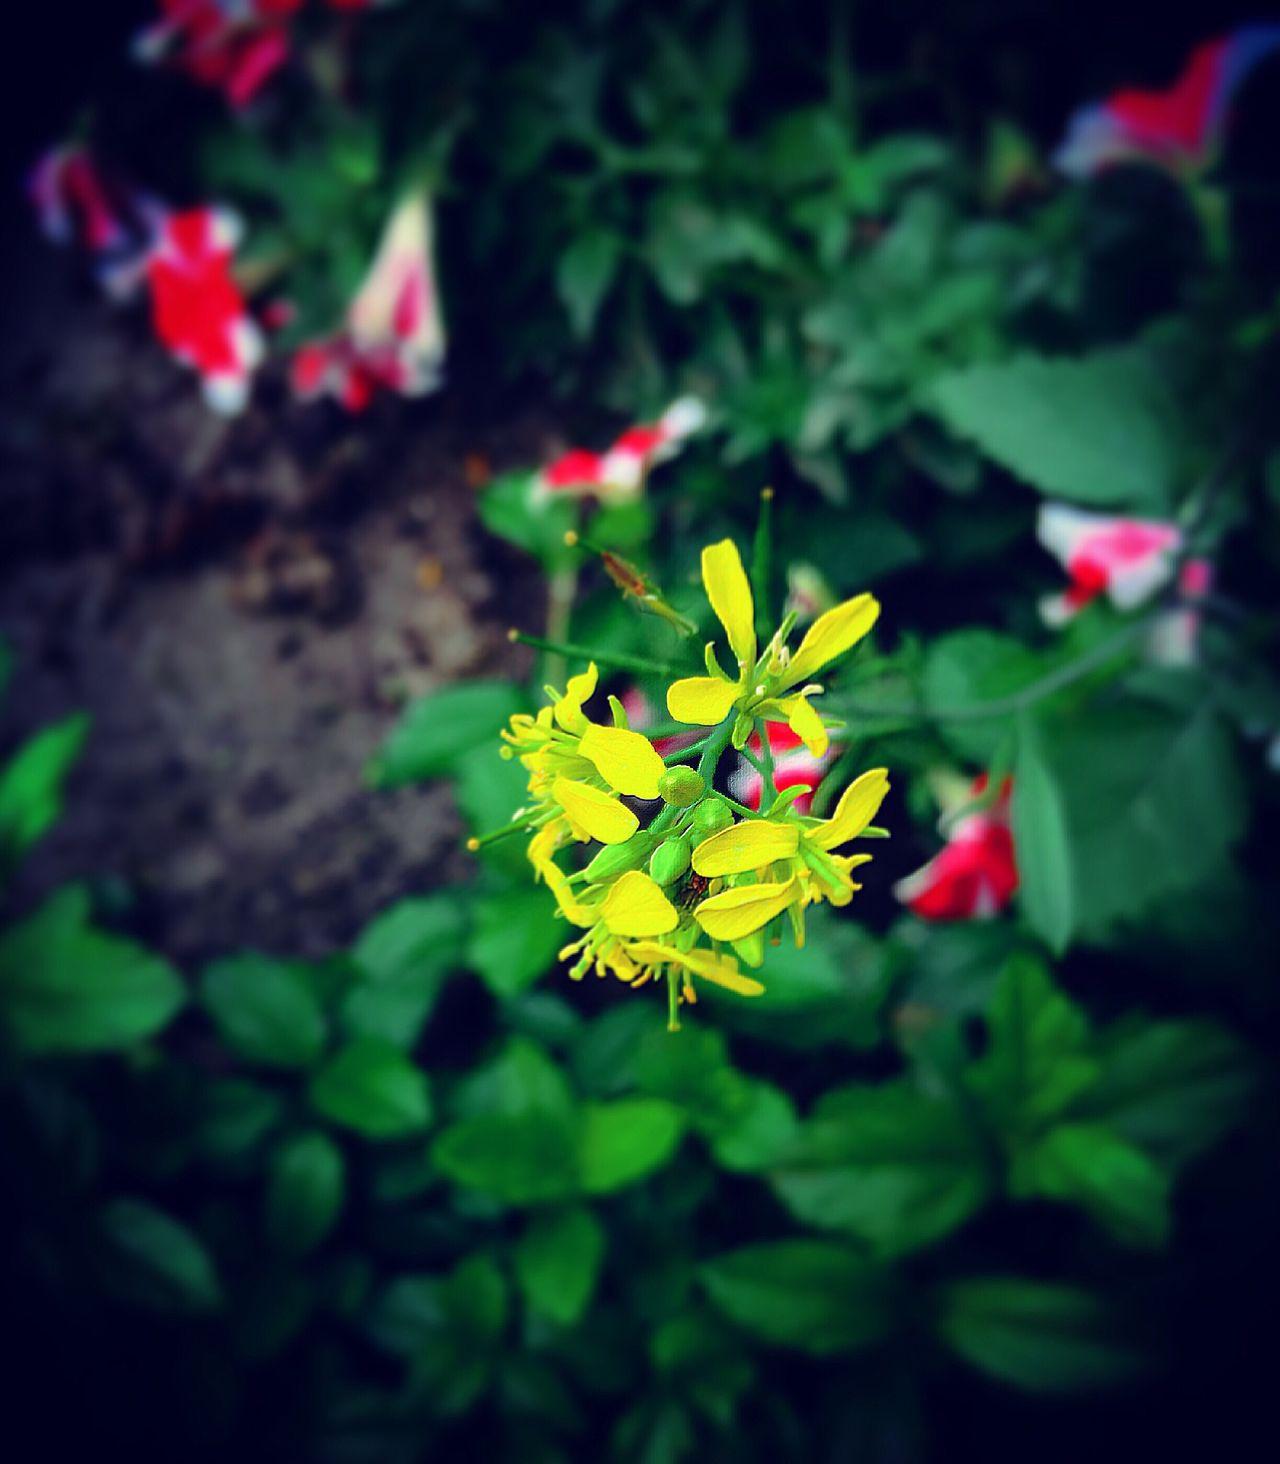 Sunshineyellow Littleflower